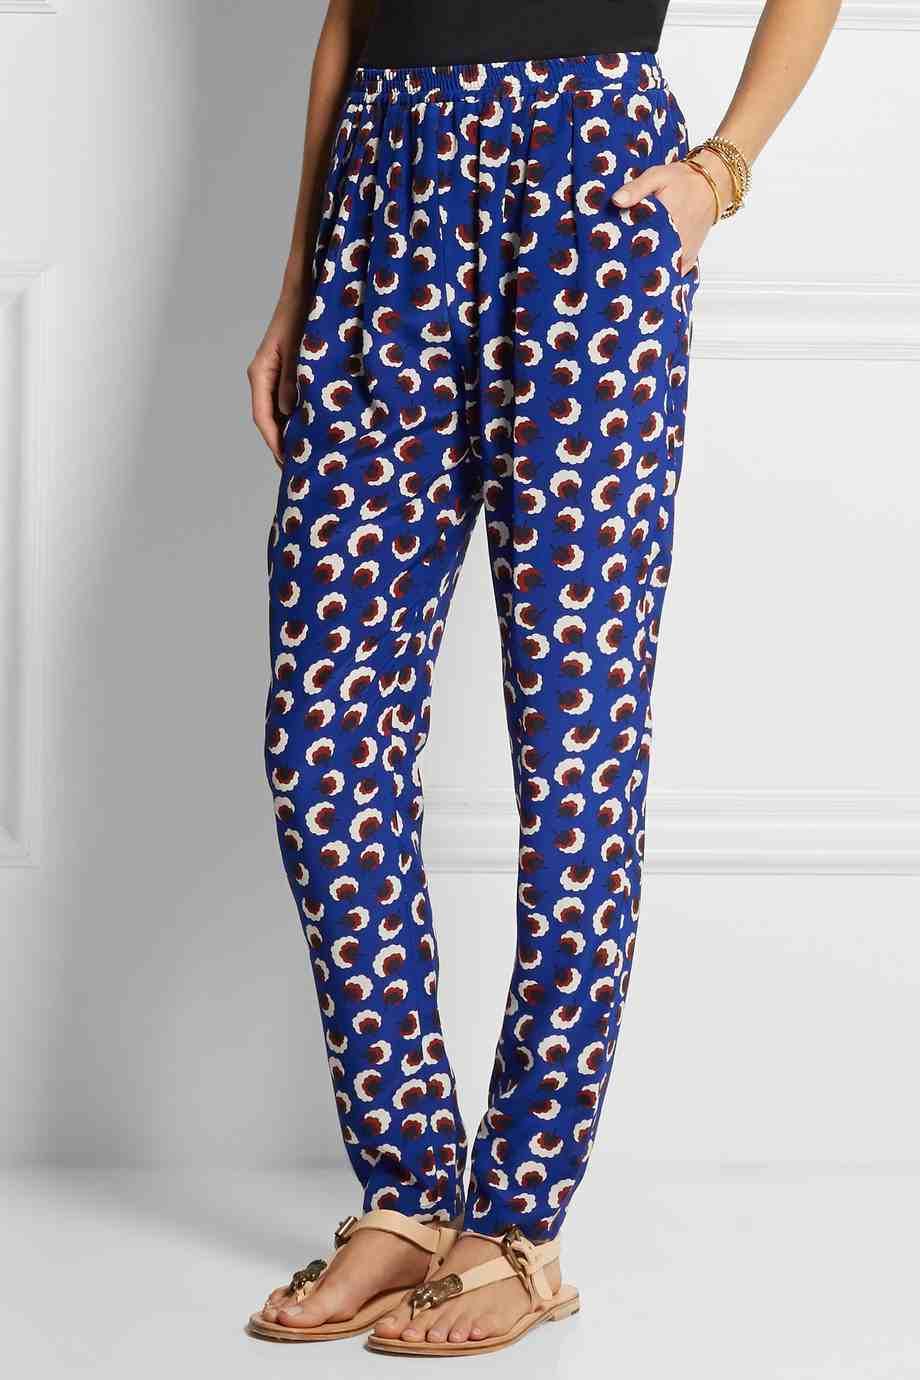 Stella McCartney - Pantalon(385 €)